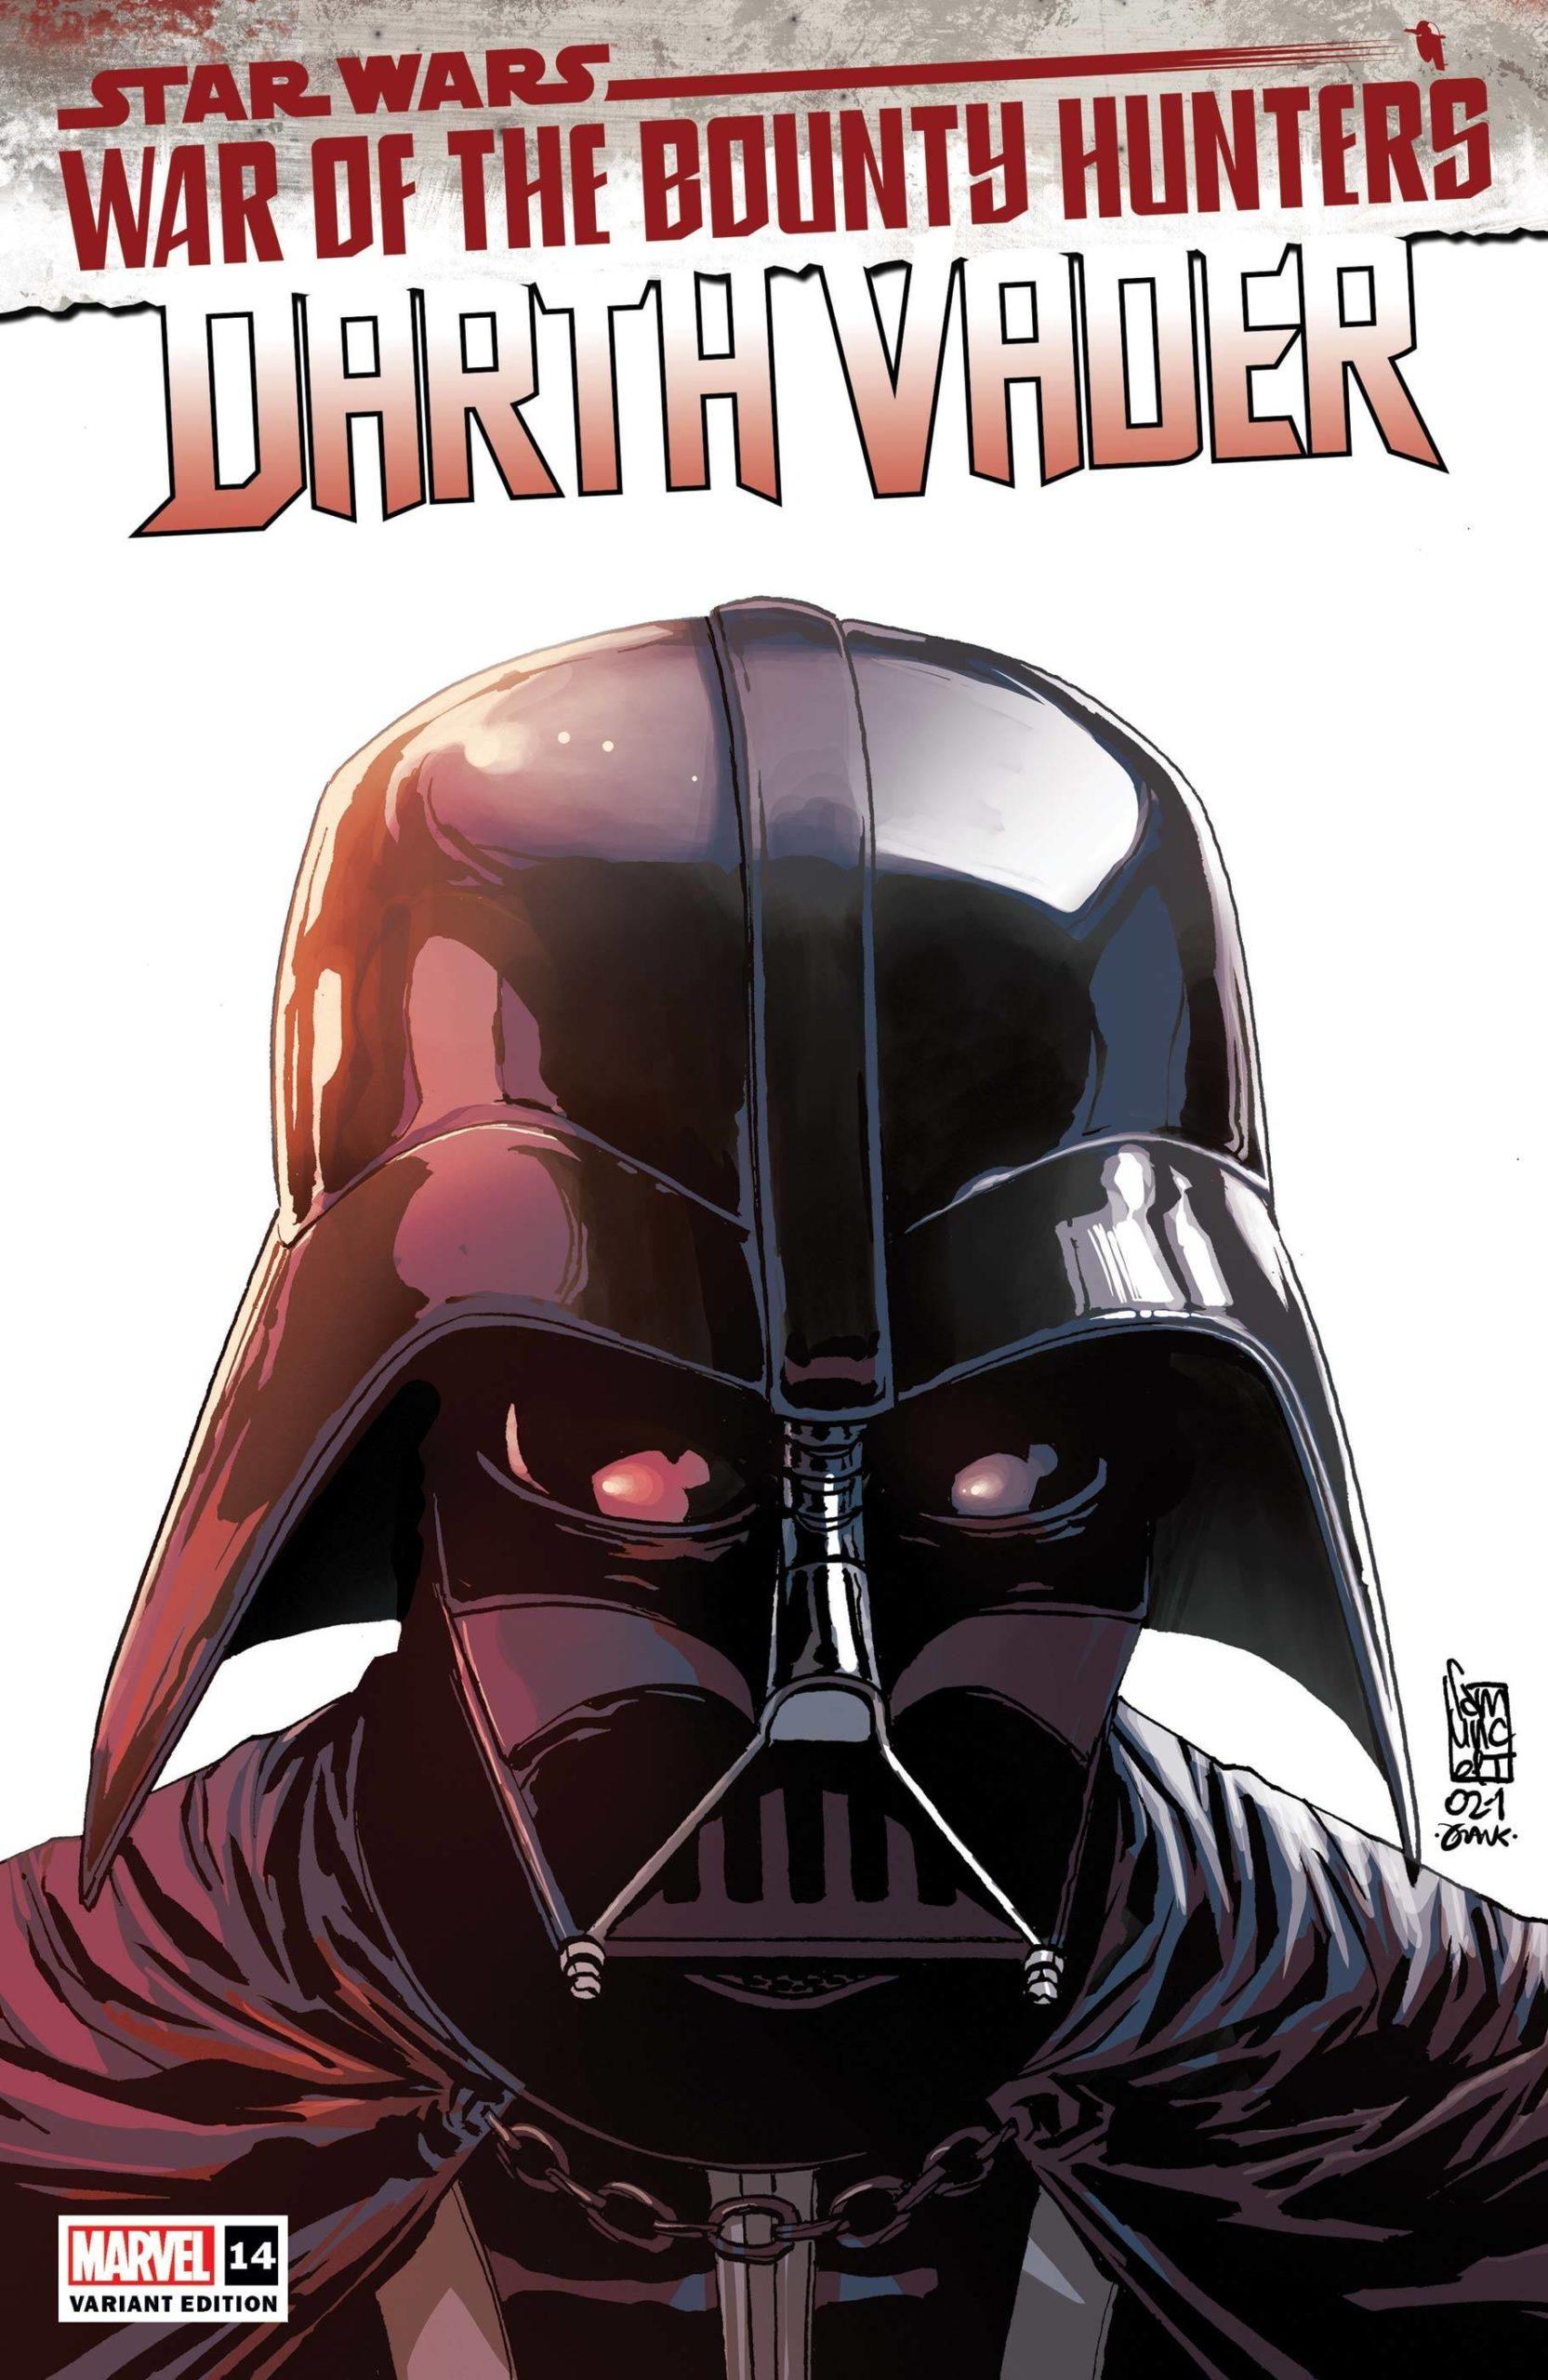 Darth Vader #14 (Giuseppe Camuncoli Variant Cover) (14.07.2021)